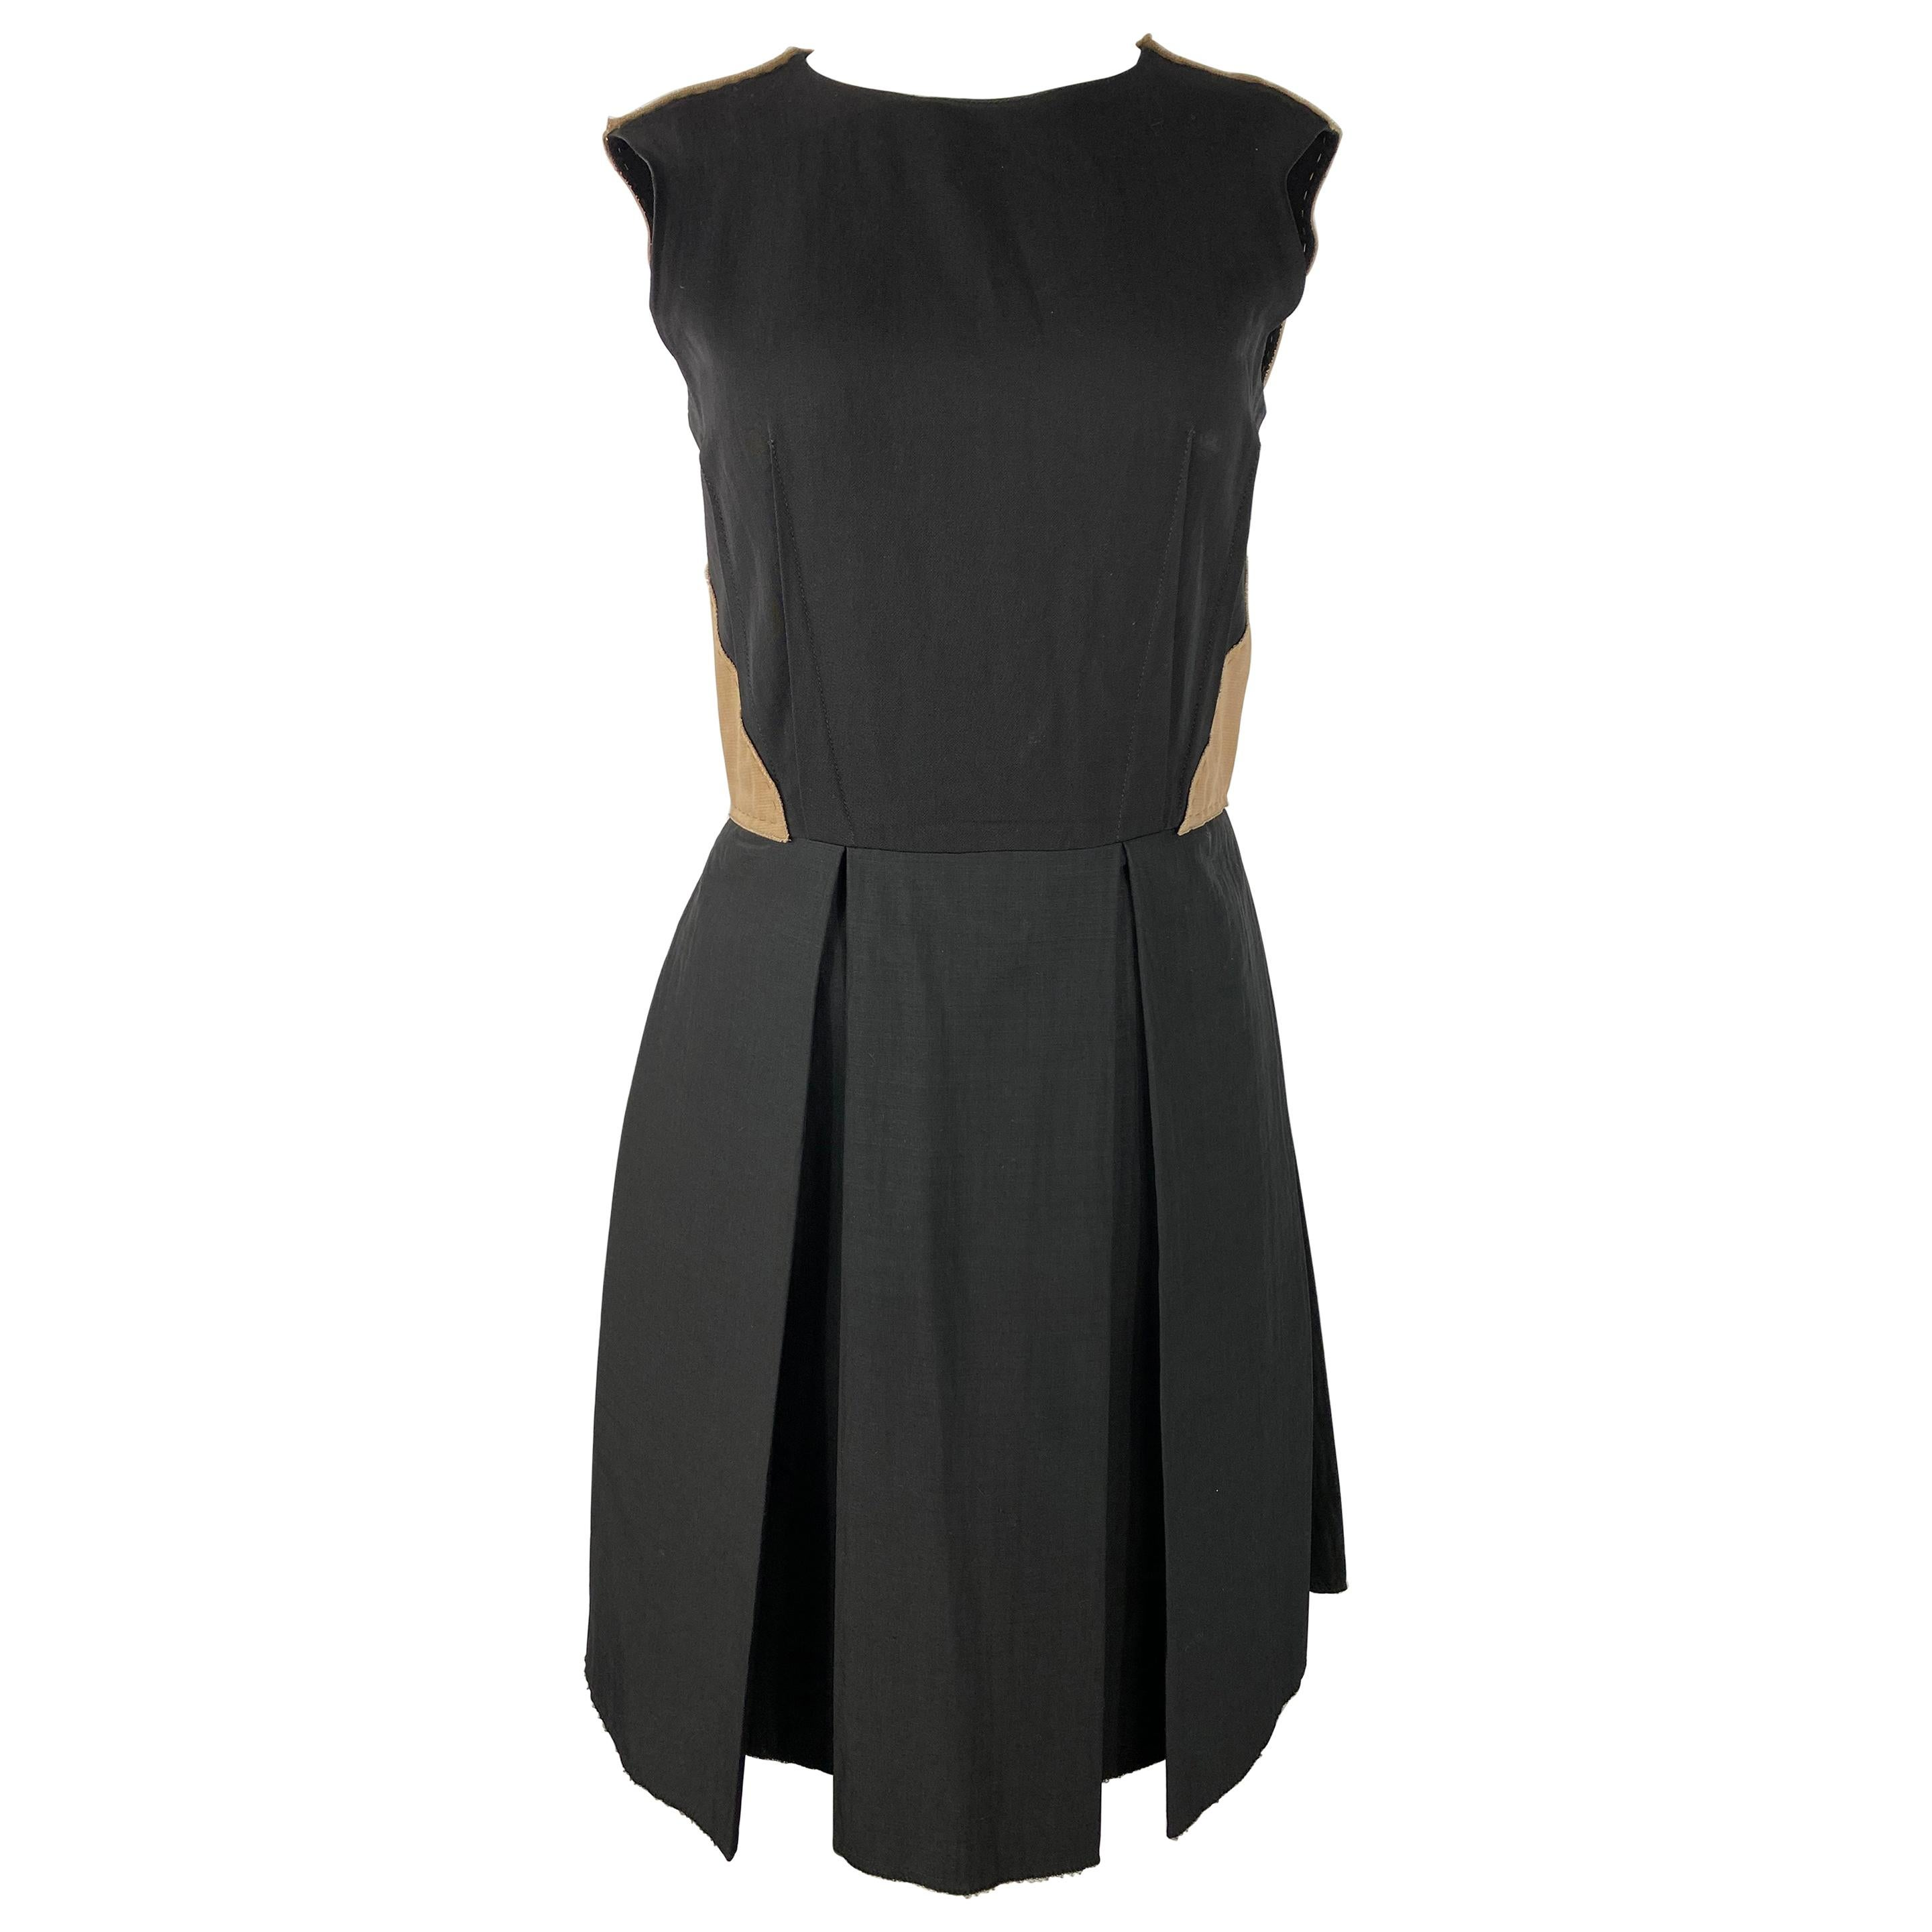 2006 LANVIN Black and Brown Mini Dress, Size 36